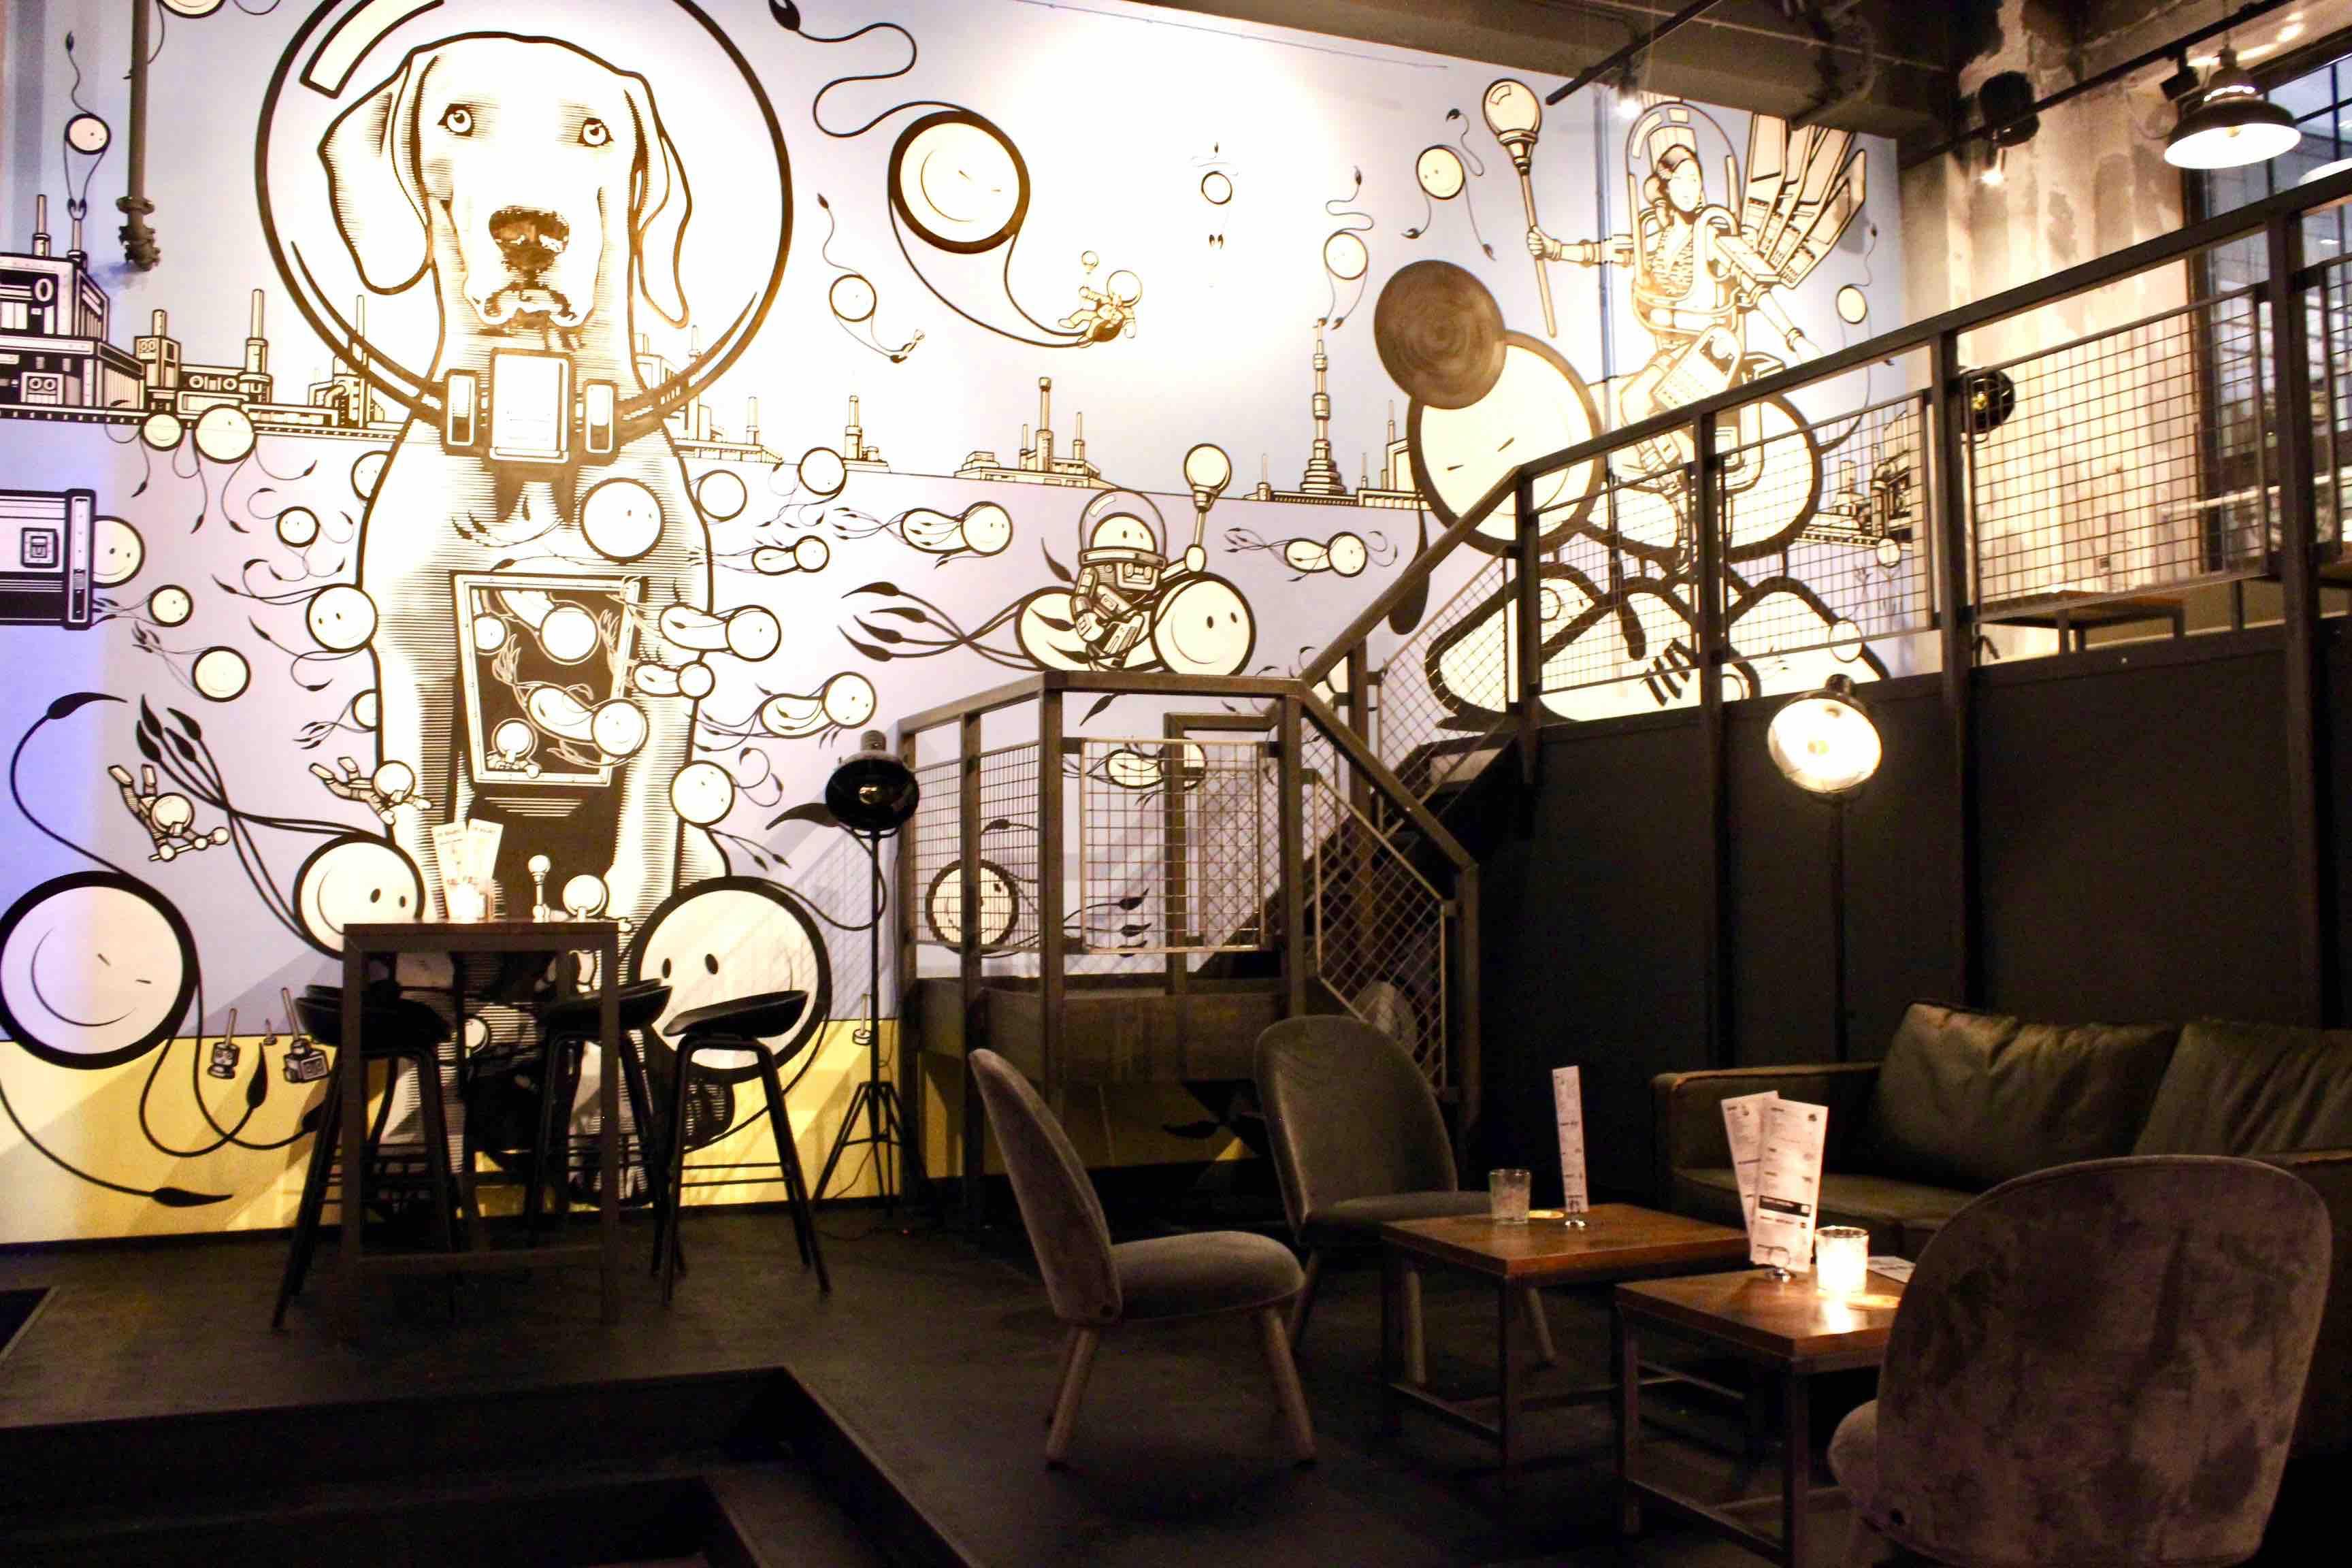 Street art restaurant de bajes amsterdam cool interieur for Interieur utrechtsestraat